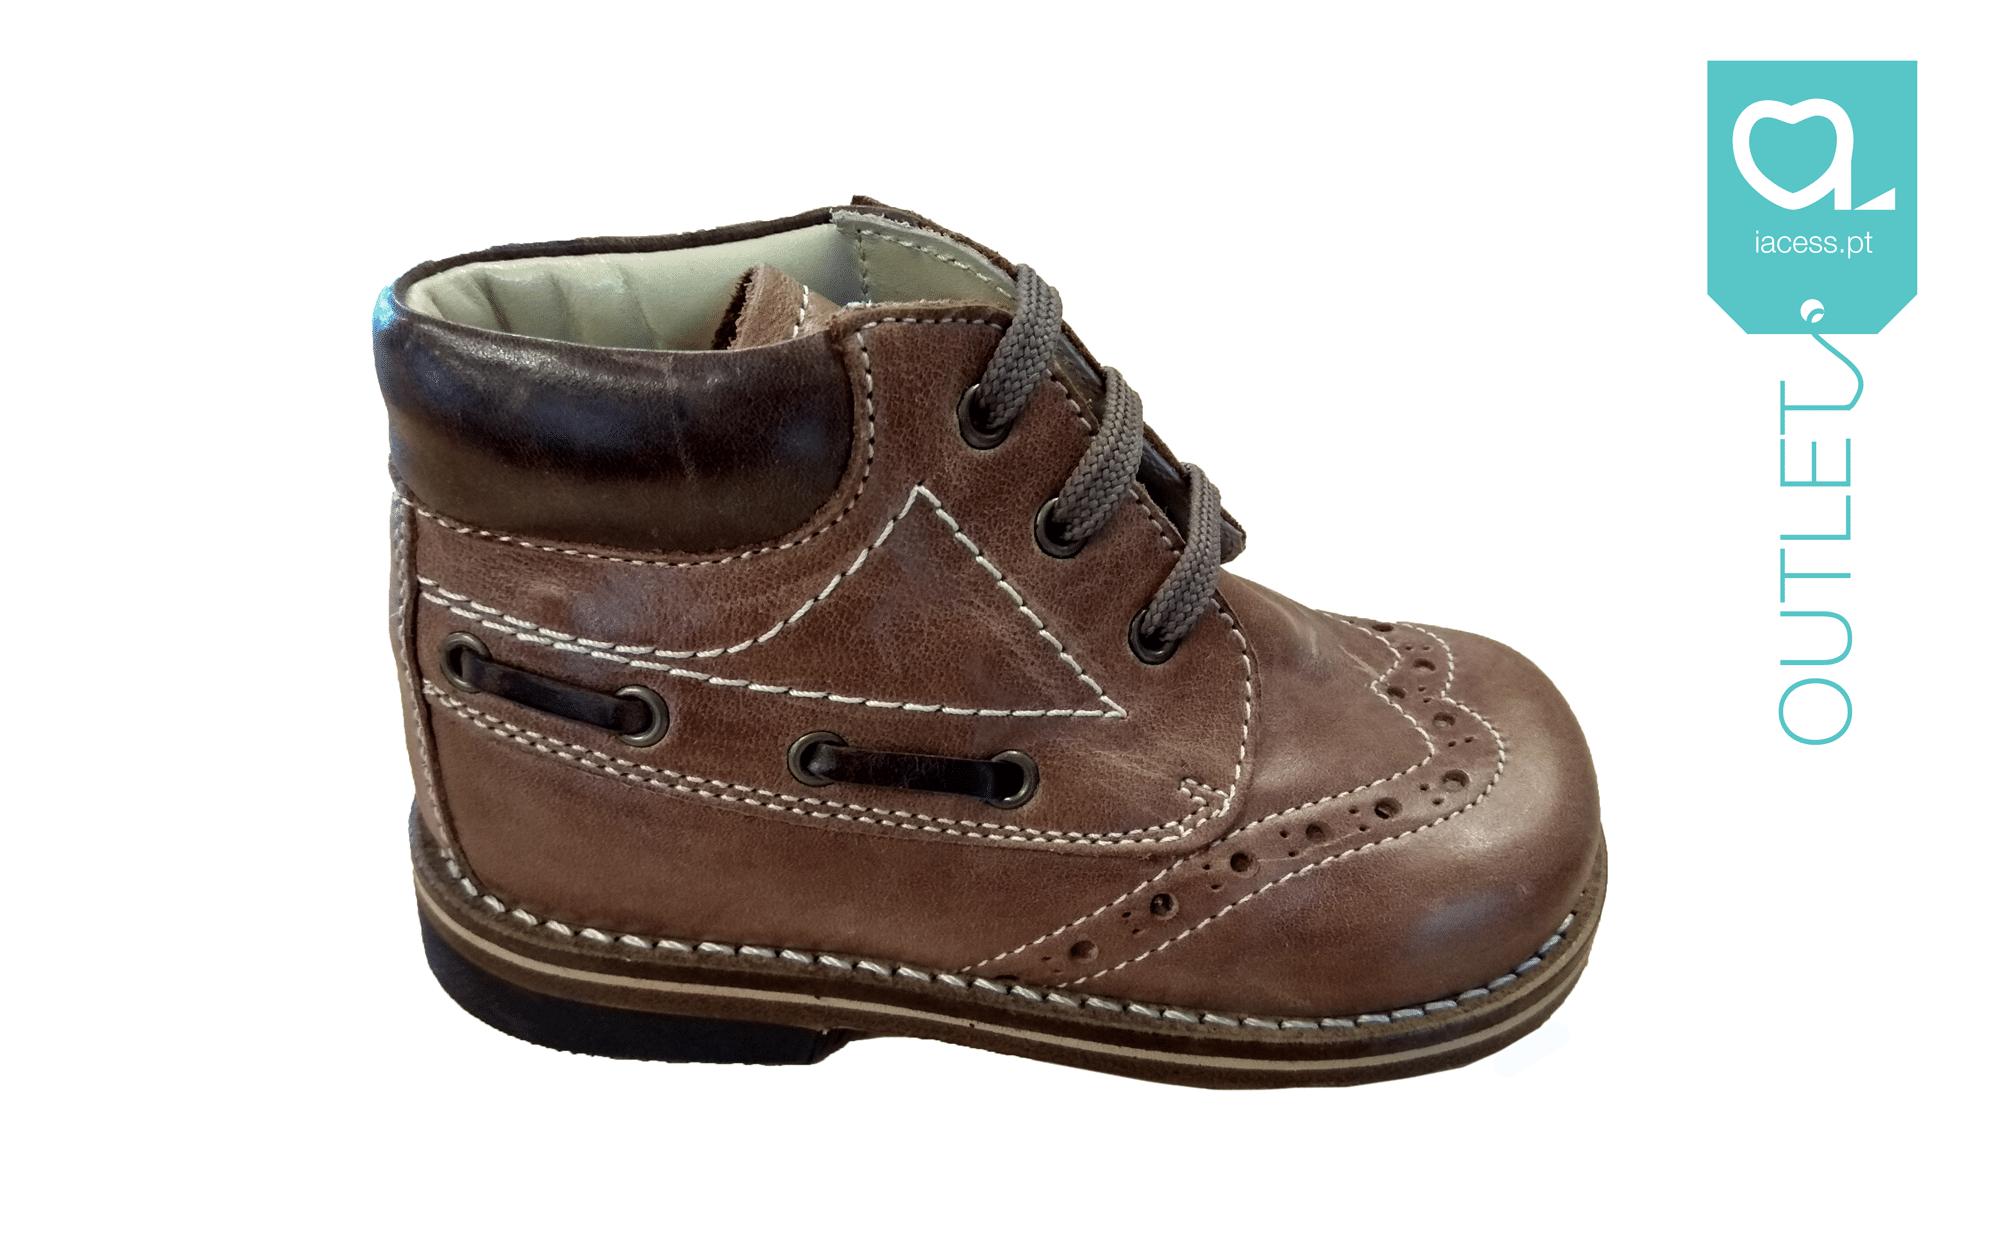 Sapatos Ortopédicos Pediátricos